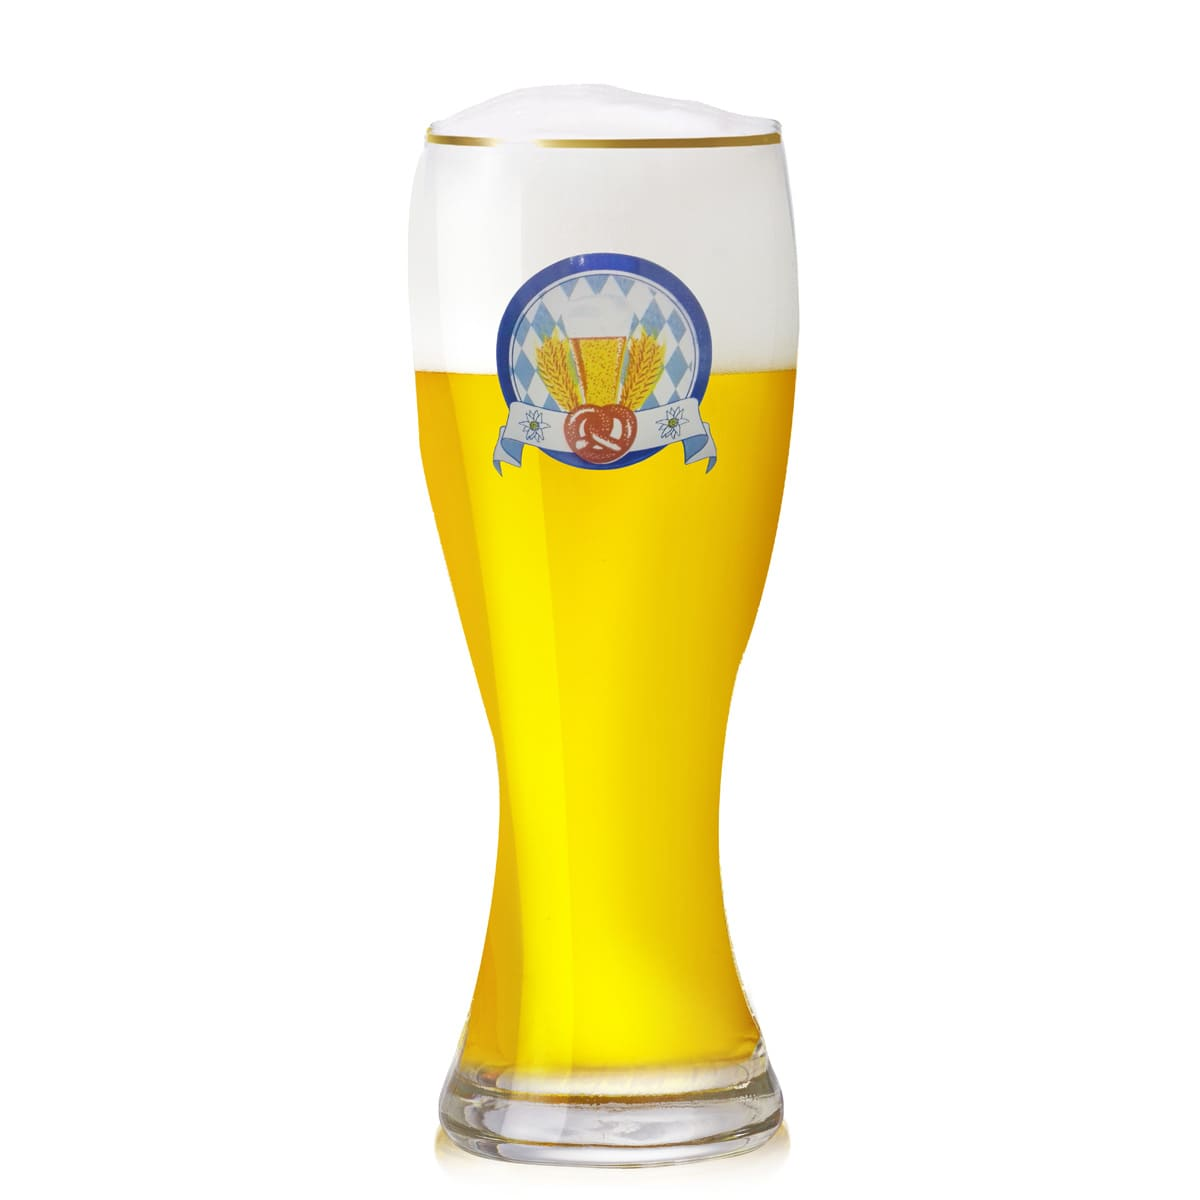 Copo de Cerveja Weiss Bavaro 600ml Vidro